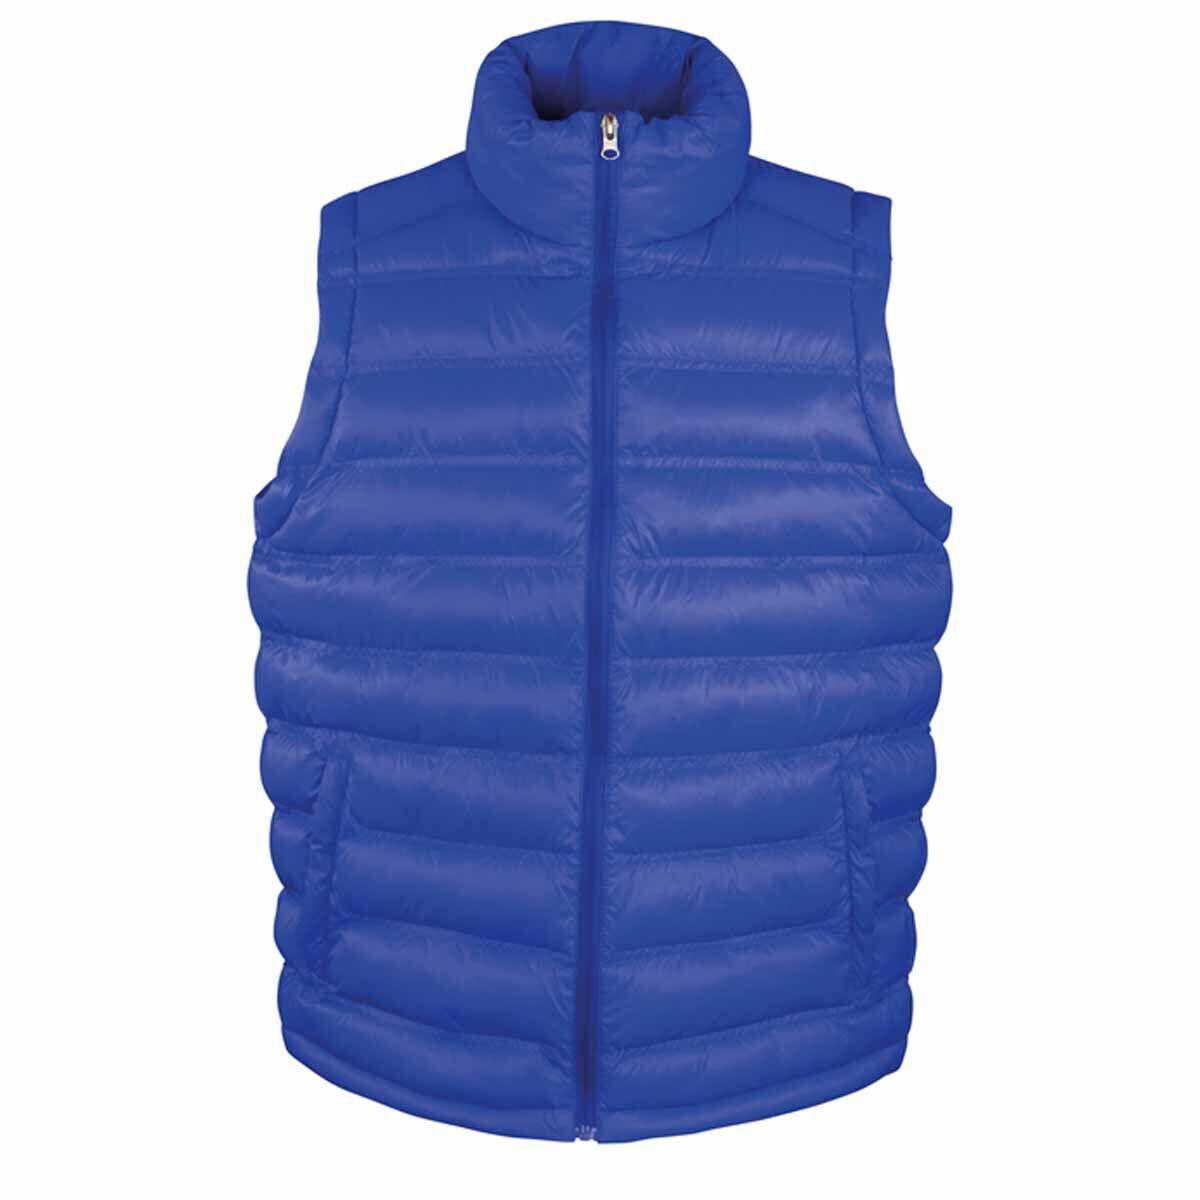 Doudoune anorak sans manches bodywarmer HOMME - R193M - bleu roi